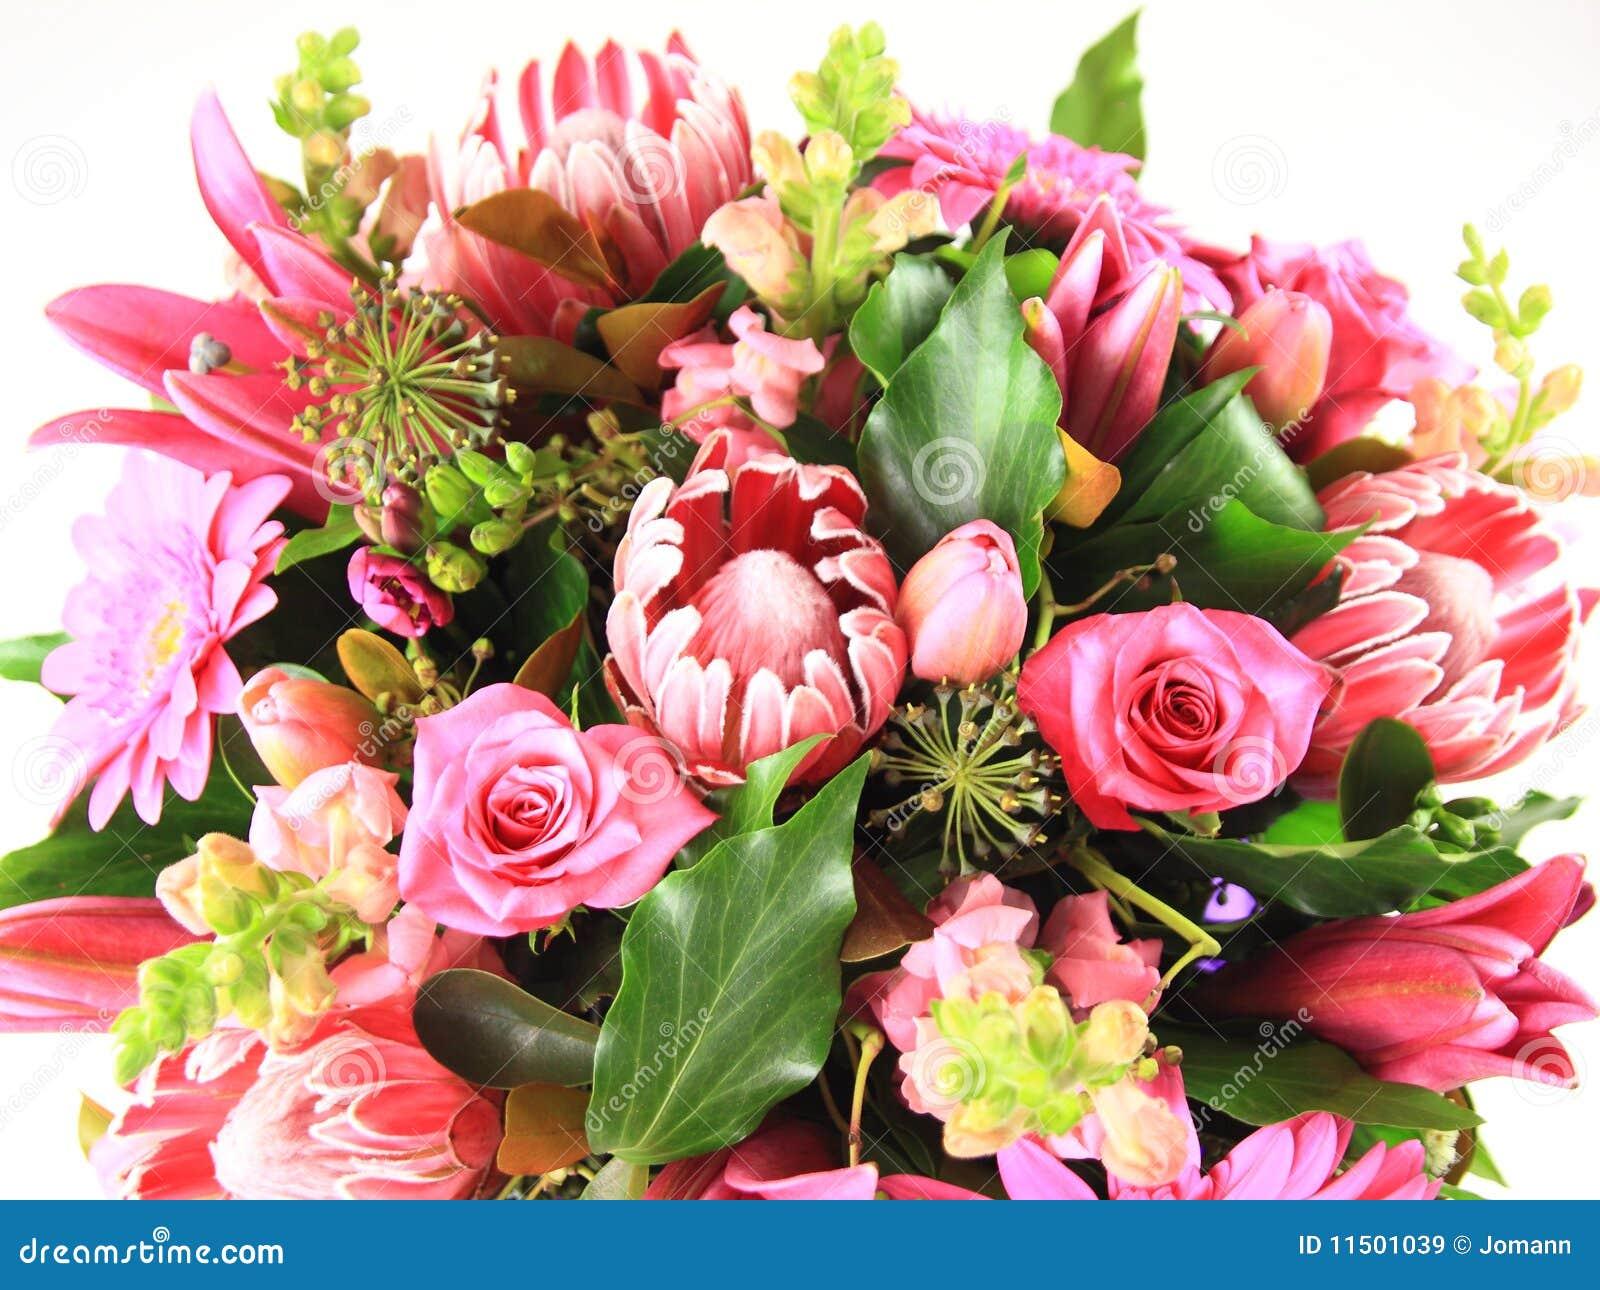 Flower Arrangement Pics flower arrangement stock photography - image: 3227562